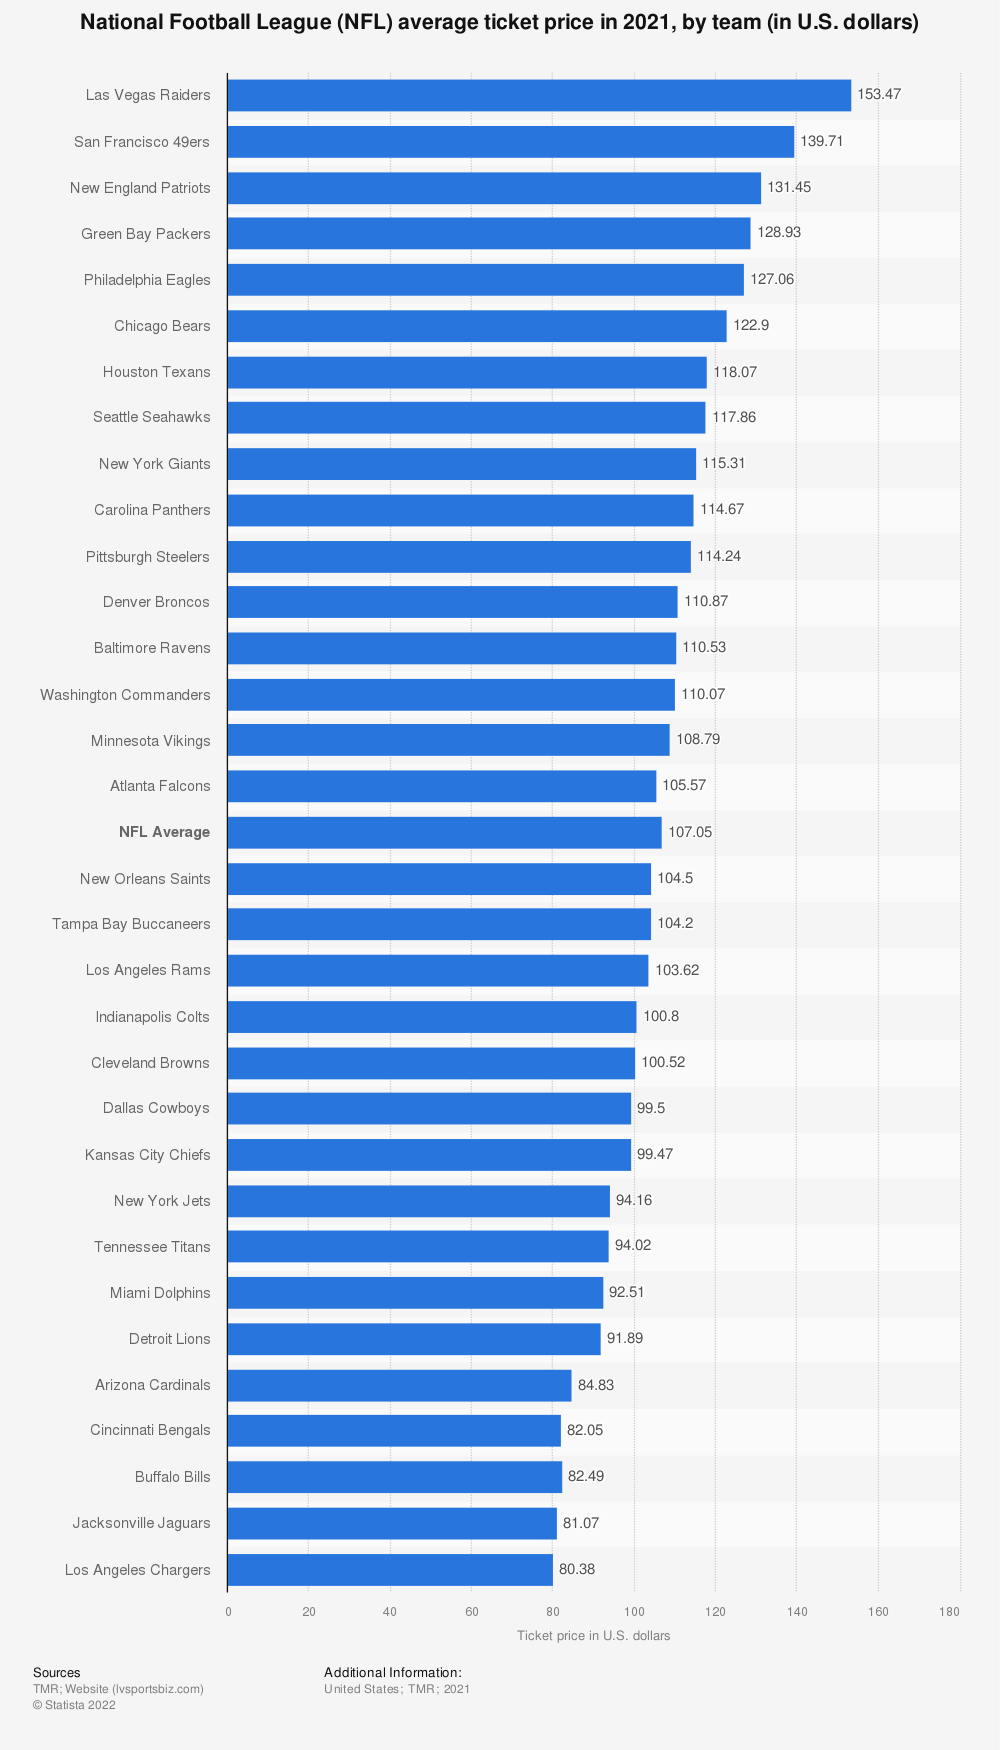 Statistic: Average NFL ticket price by team in 2018 (in U.S. dollars)* | Statista